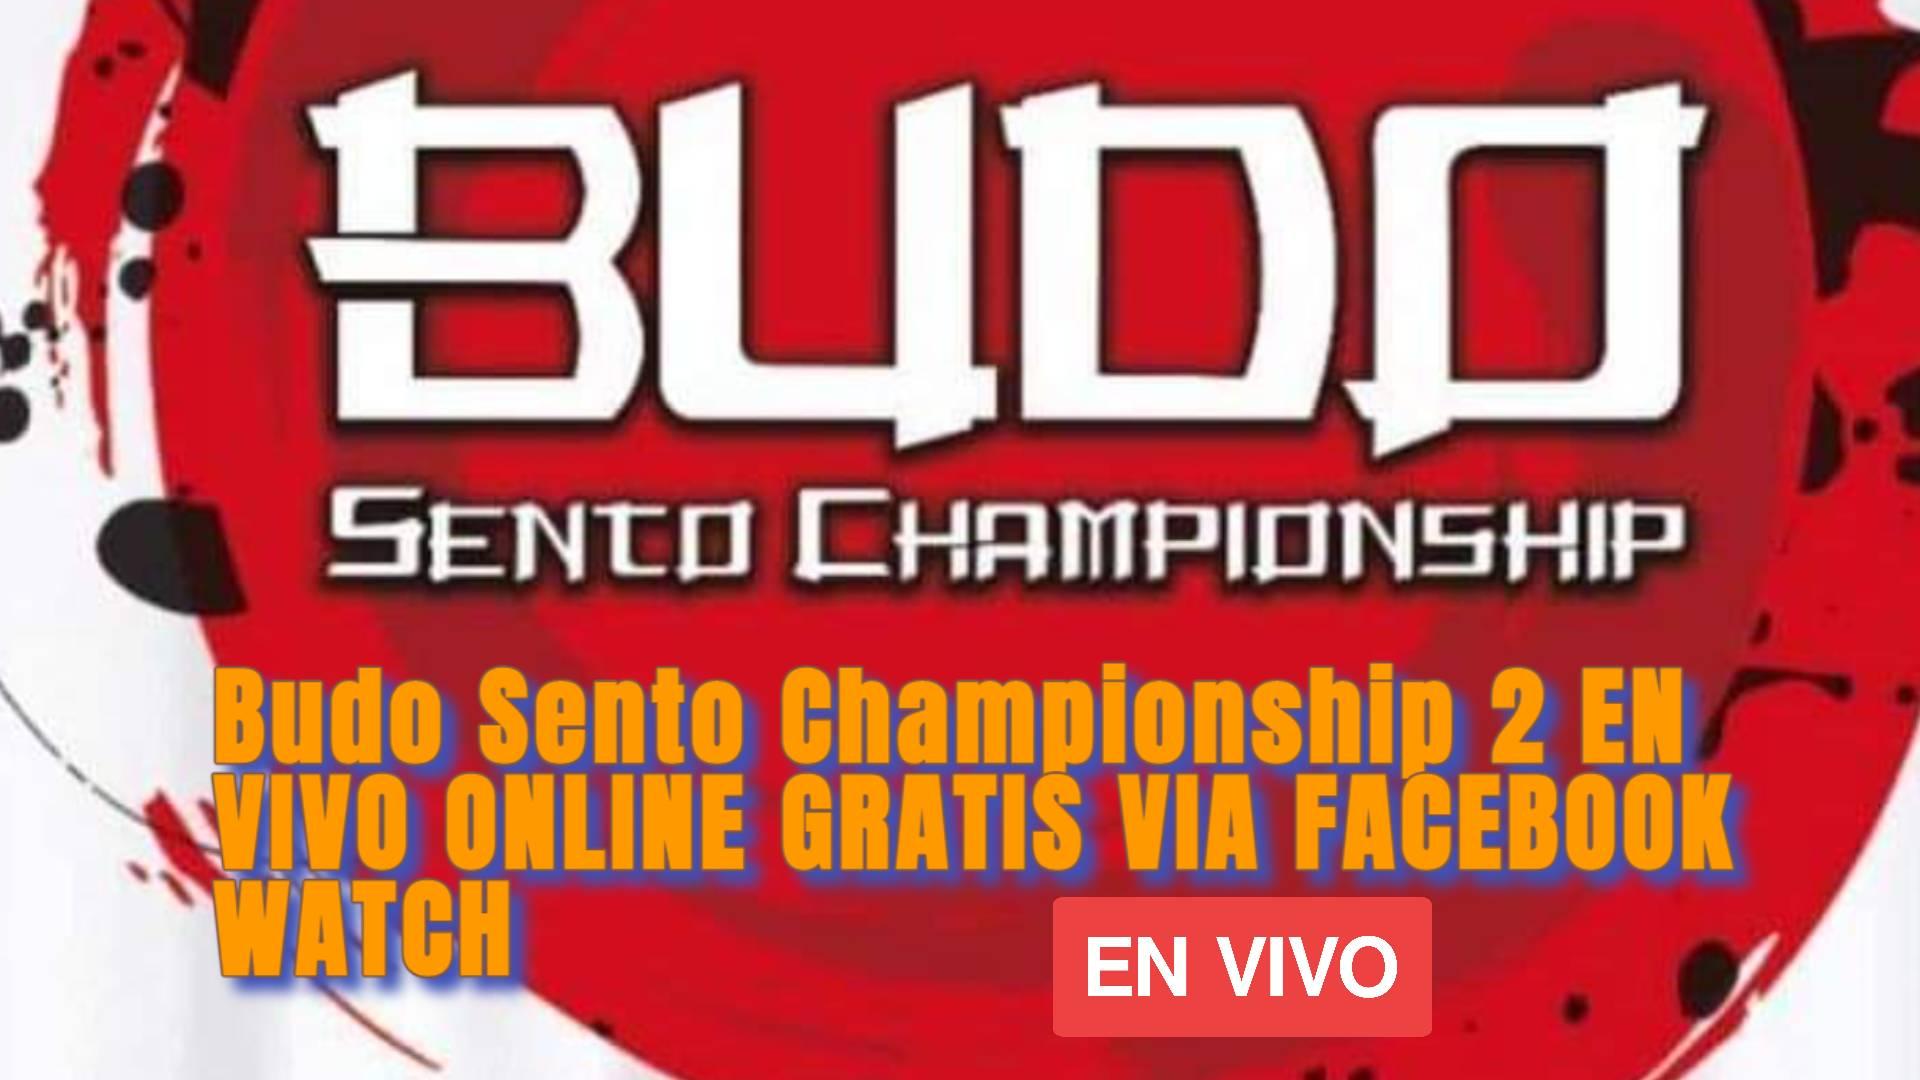 Budo Sento Championship 2 EN VIVO ONLINE GRATIS VIA FACEBOOK WATCH